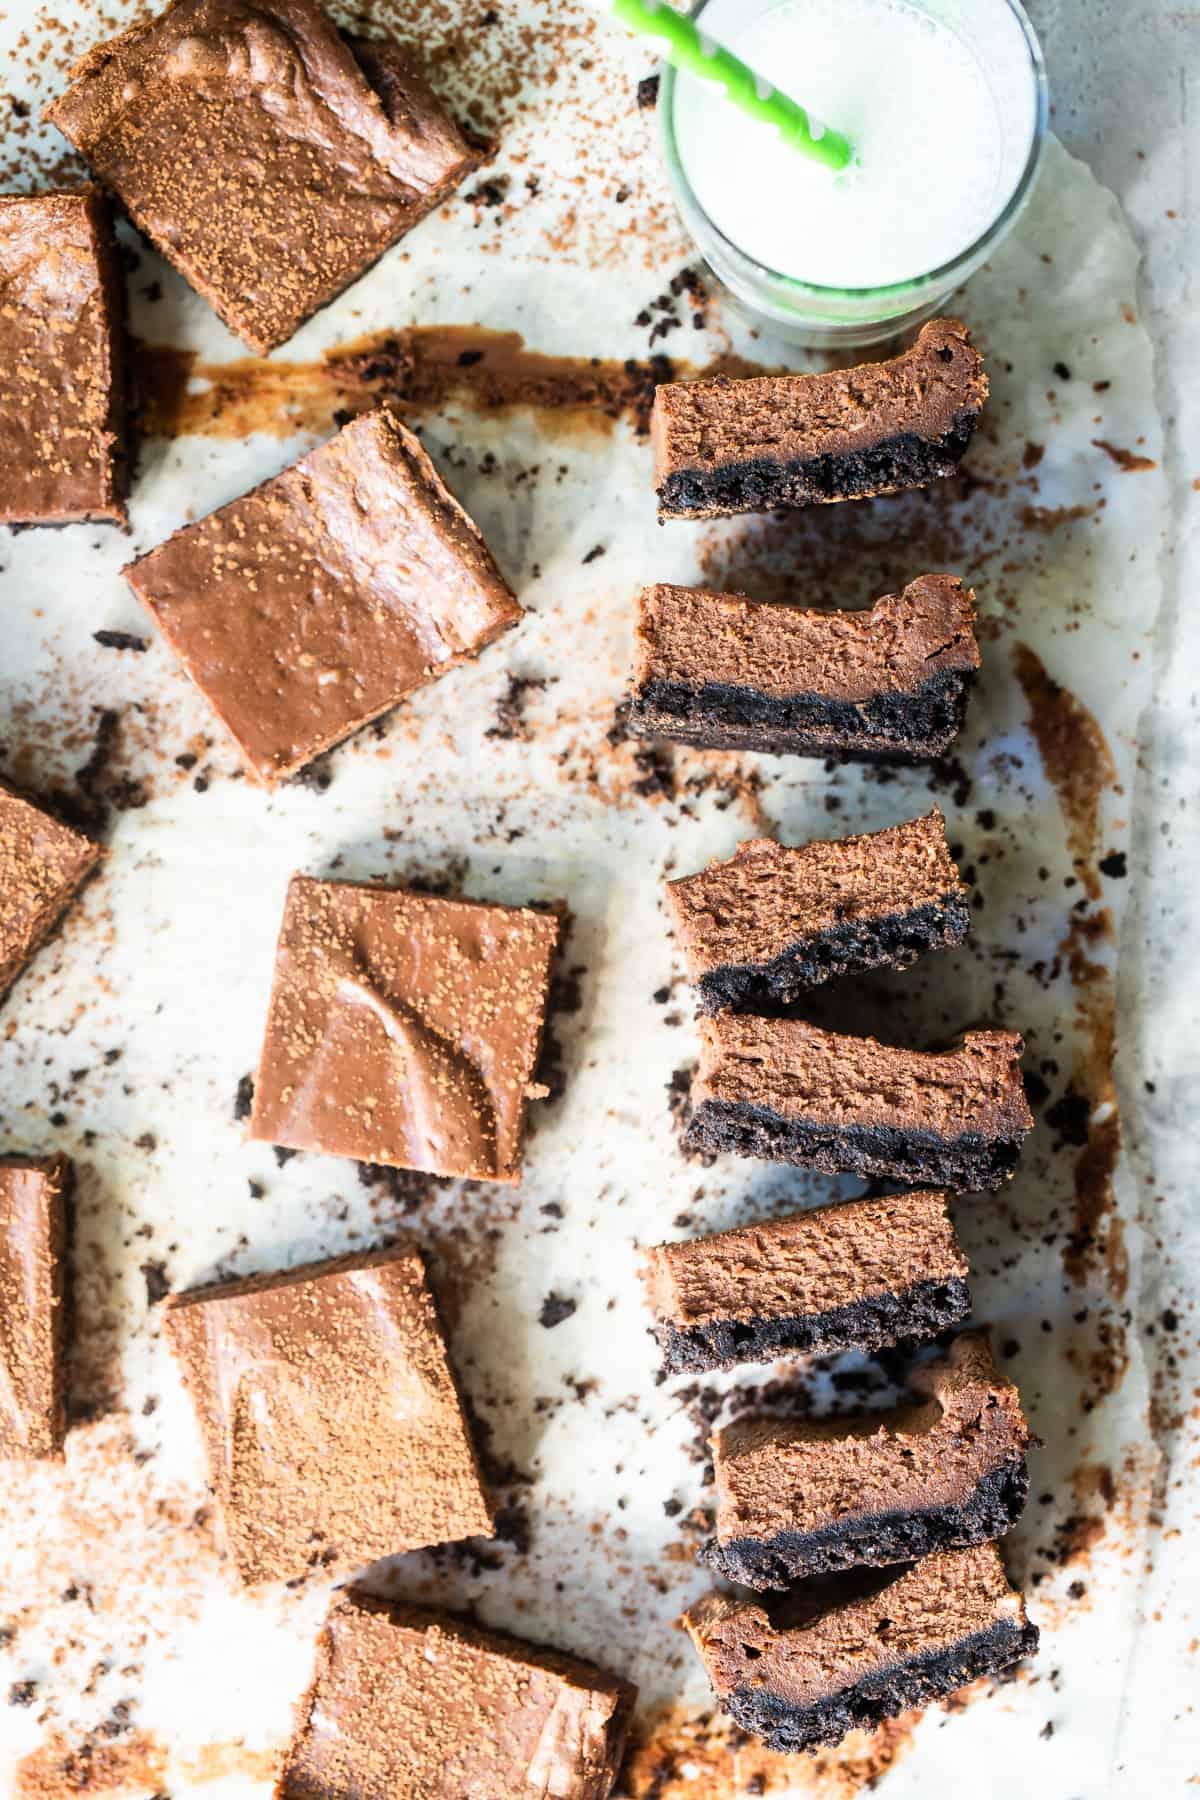 Easy chocolate cheesecake bars with milk